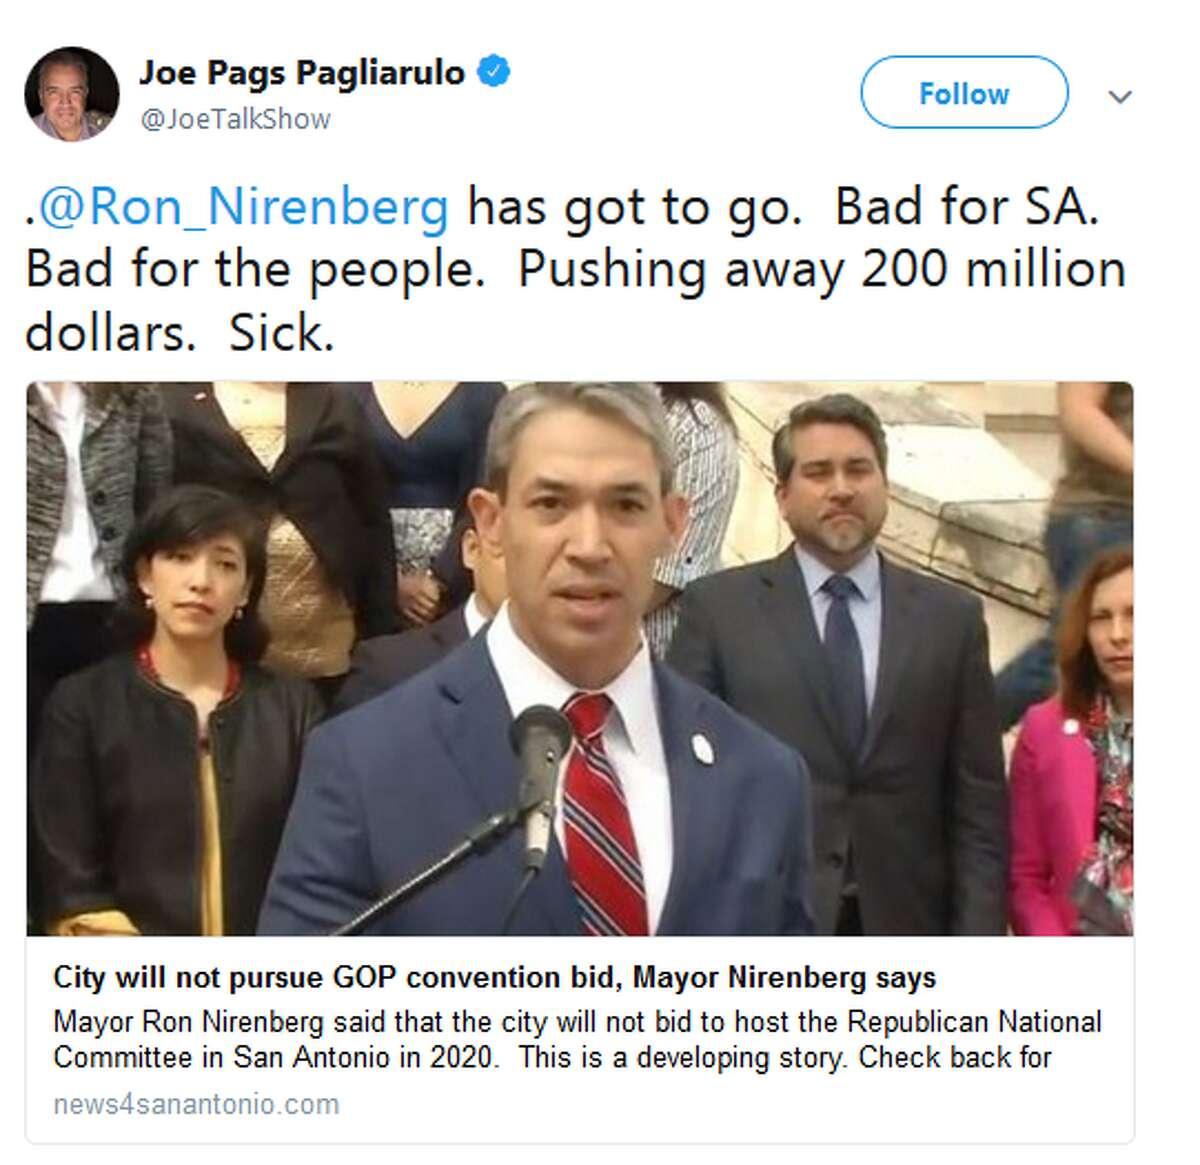 @JoeTalkShow: .@Ron_Nirenberg has got to go. Bad for SA. Bad for the people. Pushing away 200 million dollars. Sick.